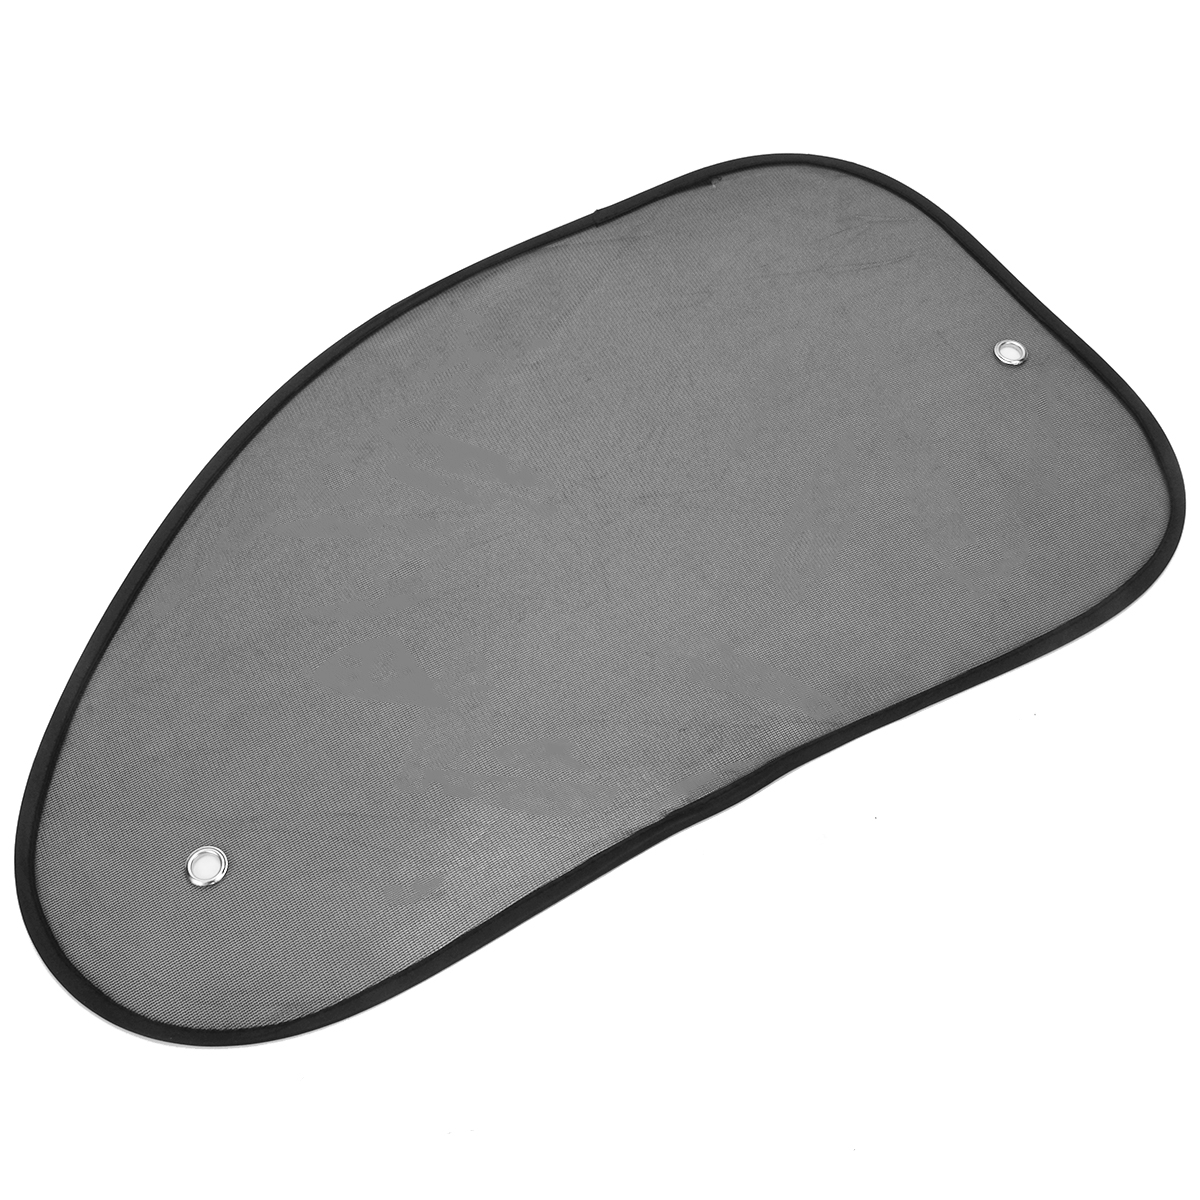 Image 4 - 2Pcs 65 *38cm L&R Car Sun Shade Side Window Sunshade Cover Mesh Visor Shield Screen Solar UV Protection-in Sun Visors from Automobiles & Motorcycles